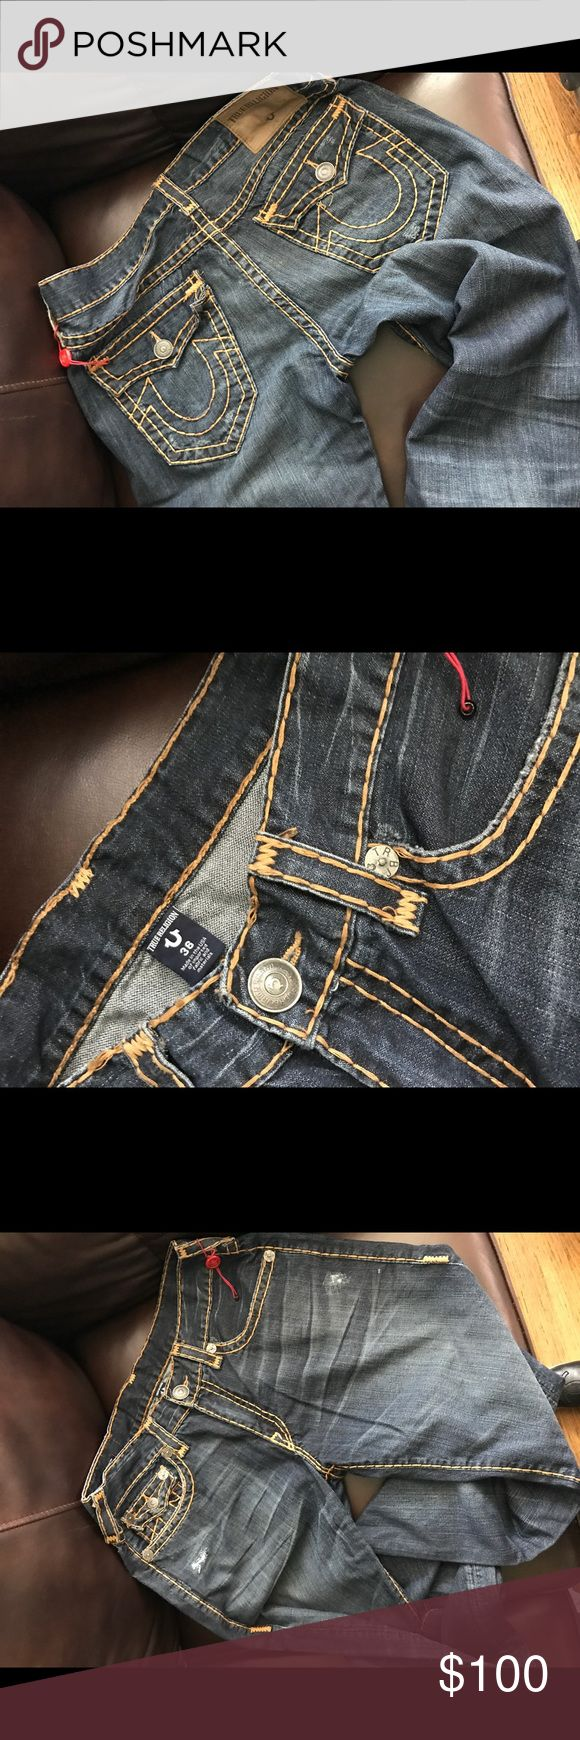 Men's True Religion Jeans Men's True Religion Jeans True Religion Jeans Bootcut